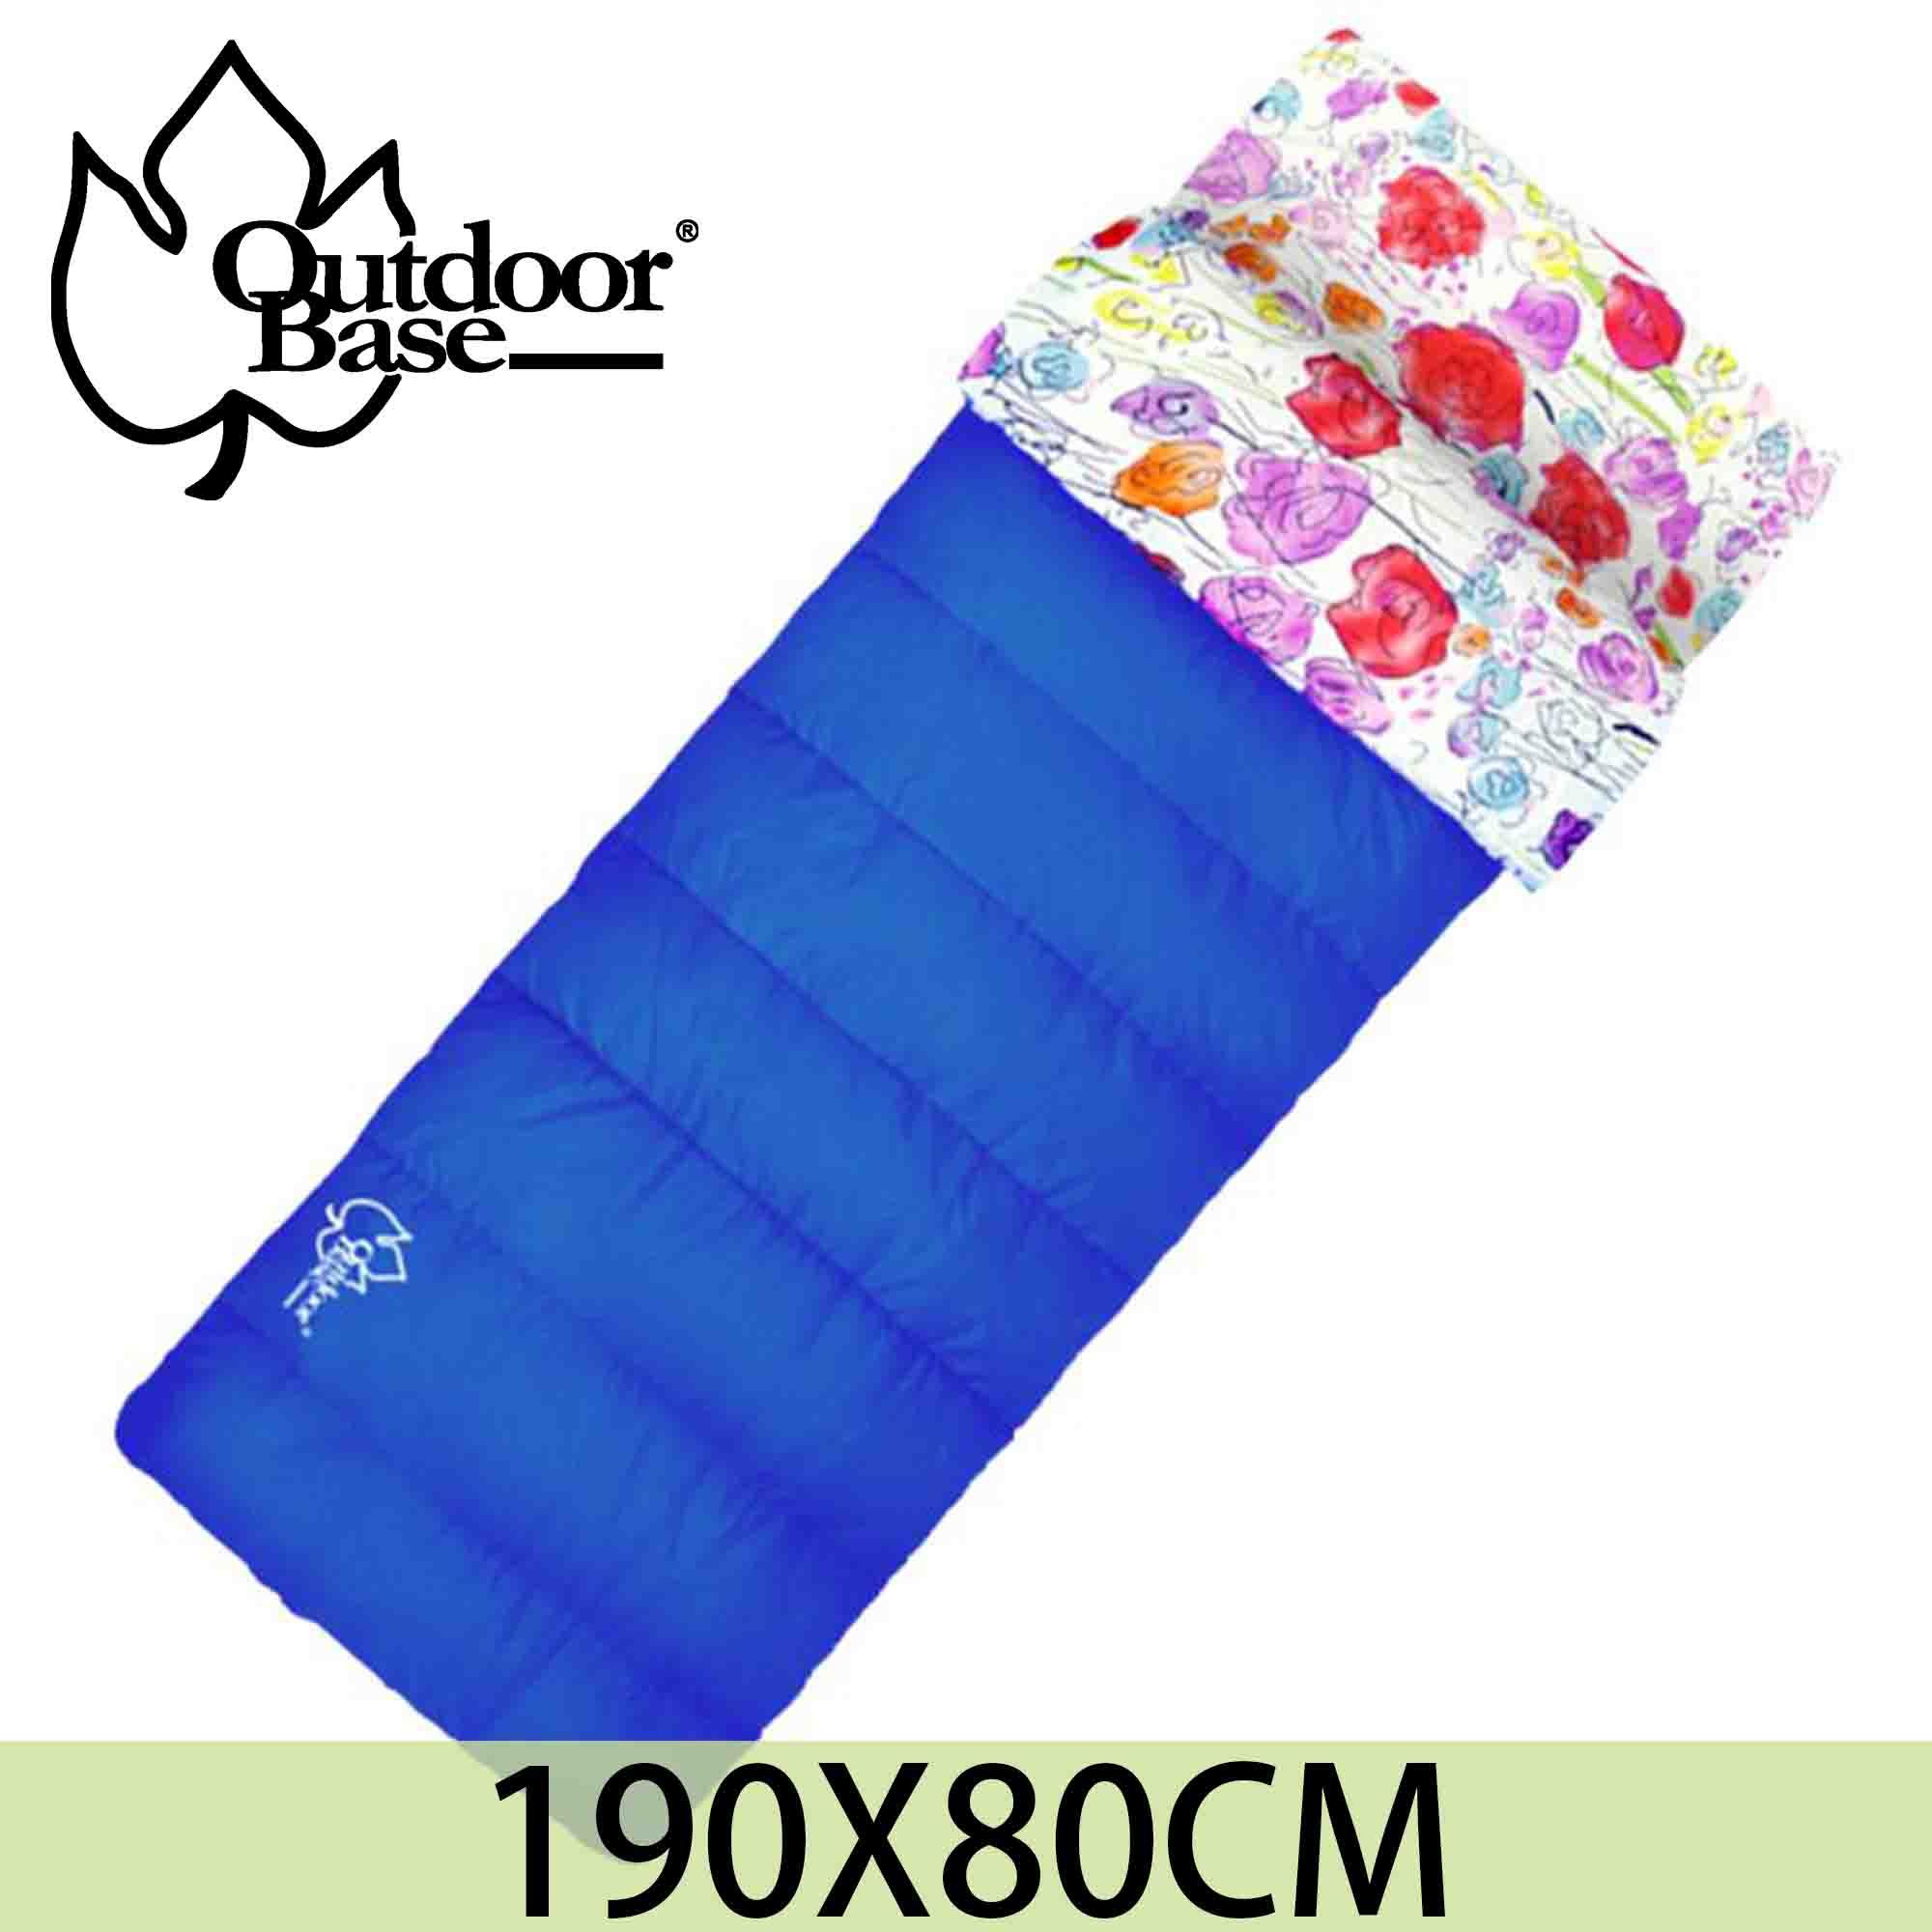 【OutdoorBase】草原印花保暖睡袋-雙拼睡袋.情侶睡袋.電視毯.客廳毯.汽車毯-24462